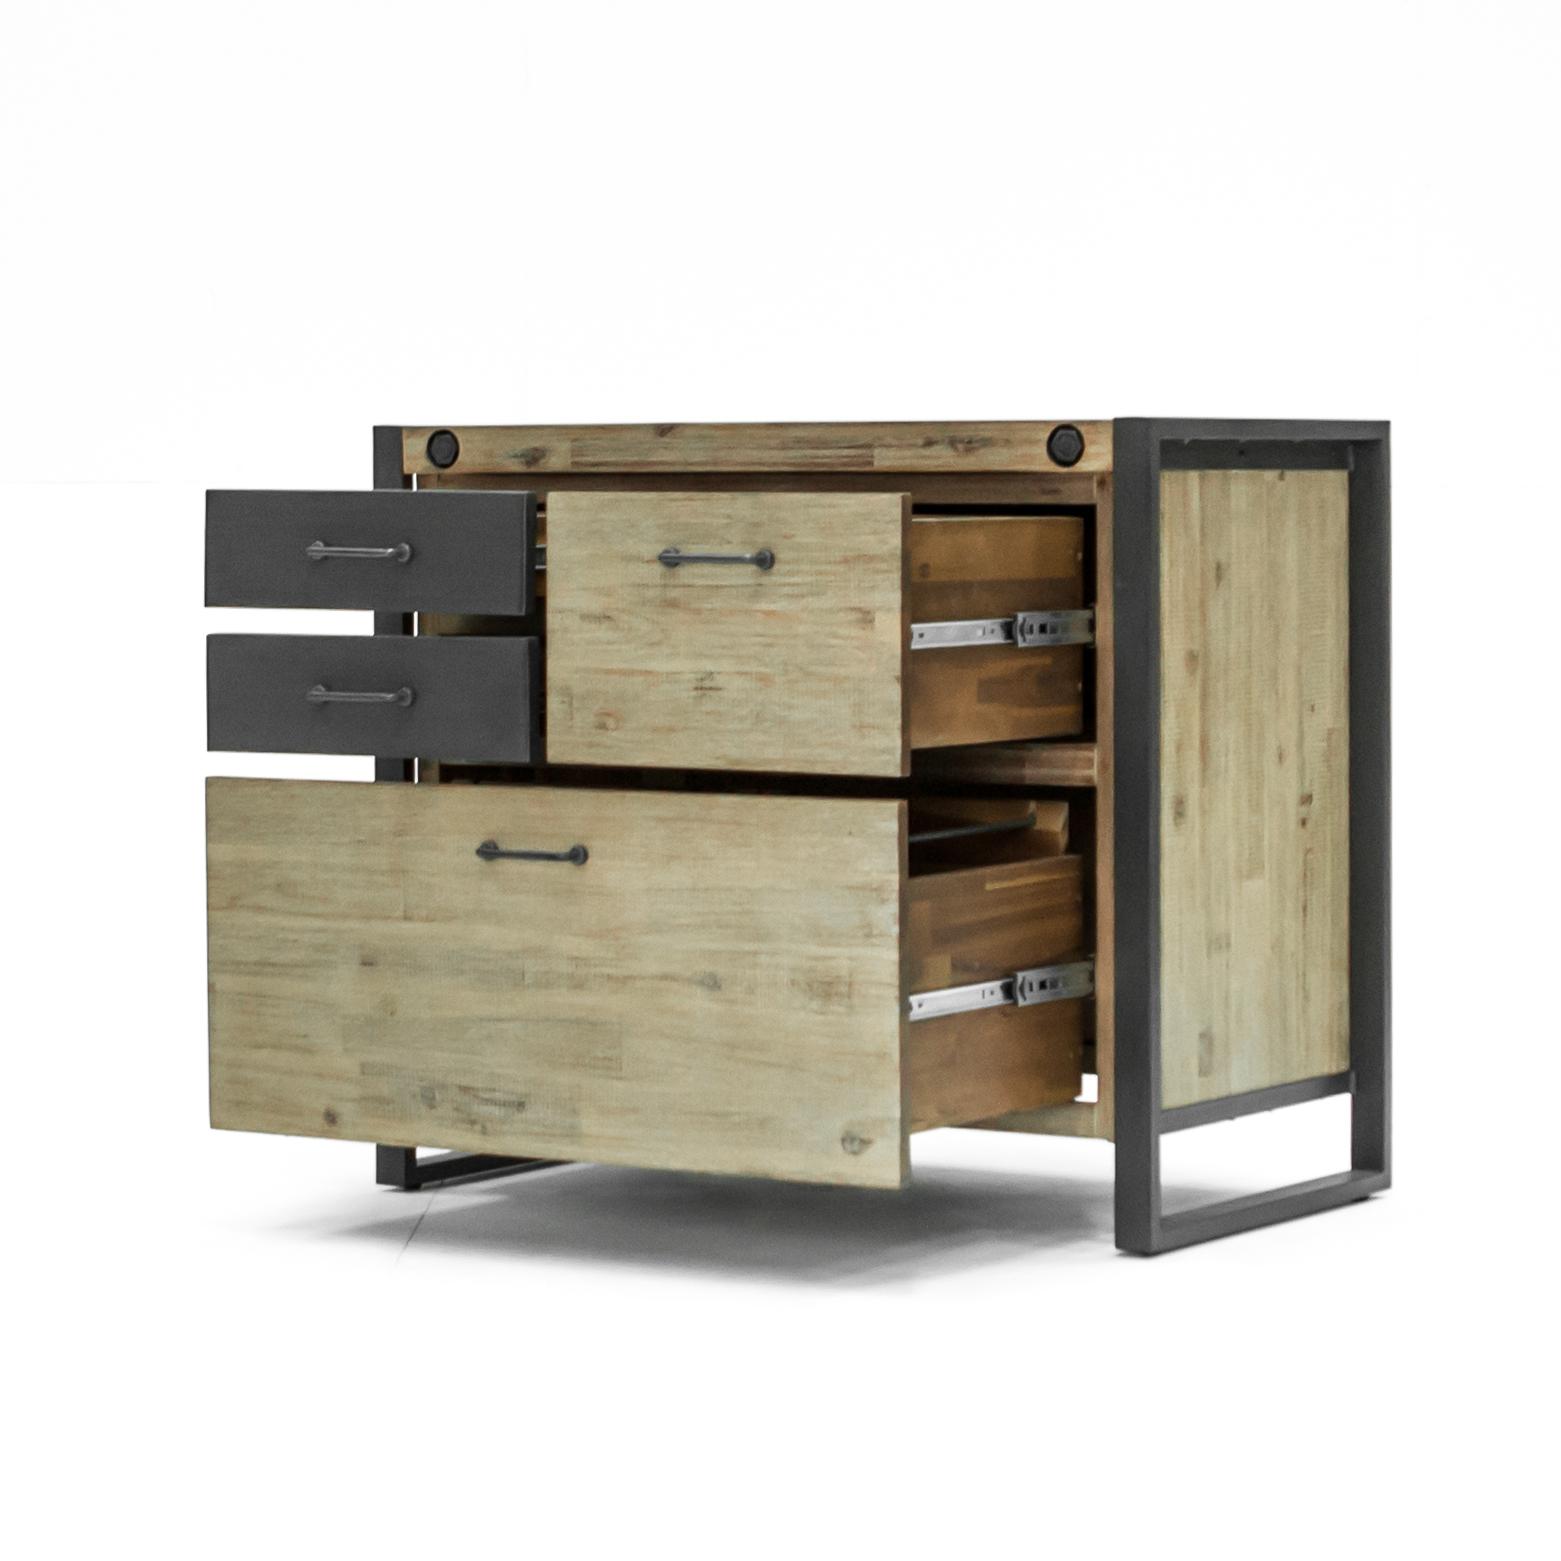 Commode Chambre Style Industriel commode / buffet / meuble de rangement inspiration indus' en acacia et  métal, 4 tiroirs dont 2 en métal 91x51x78,5cm brooklyn